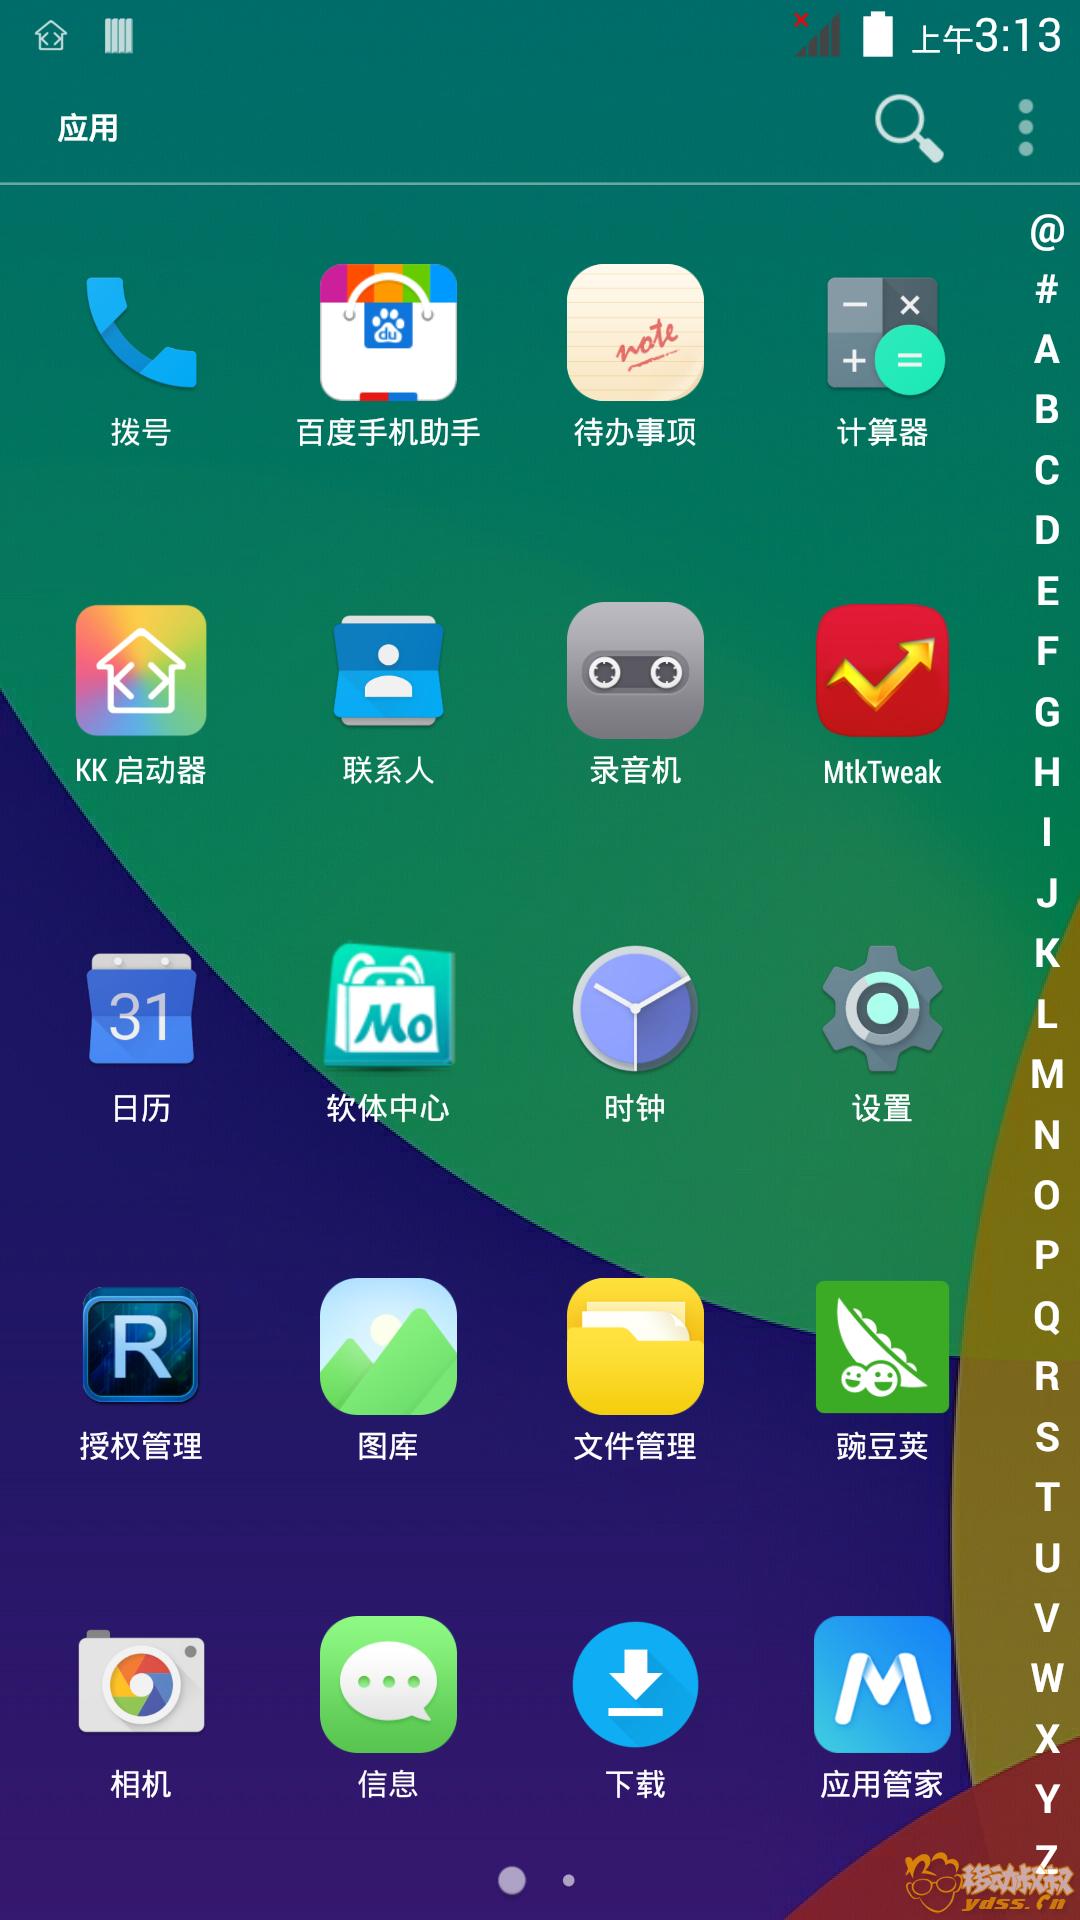 Screenshot_2015-01-01-03-13-12.png